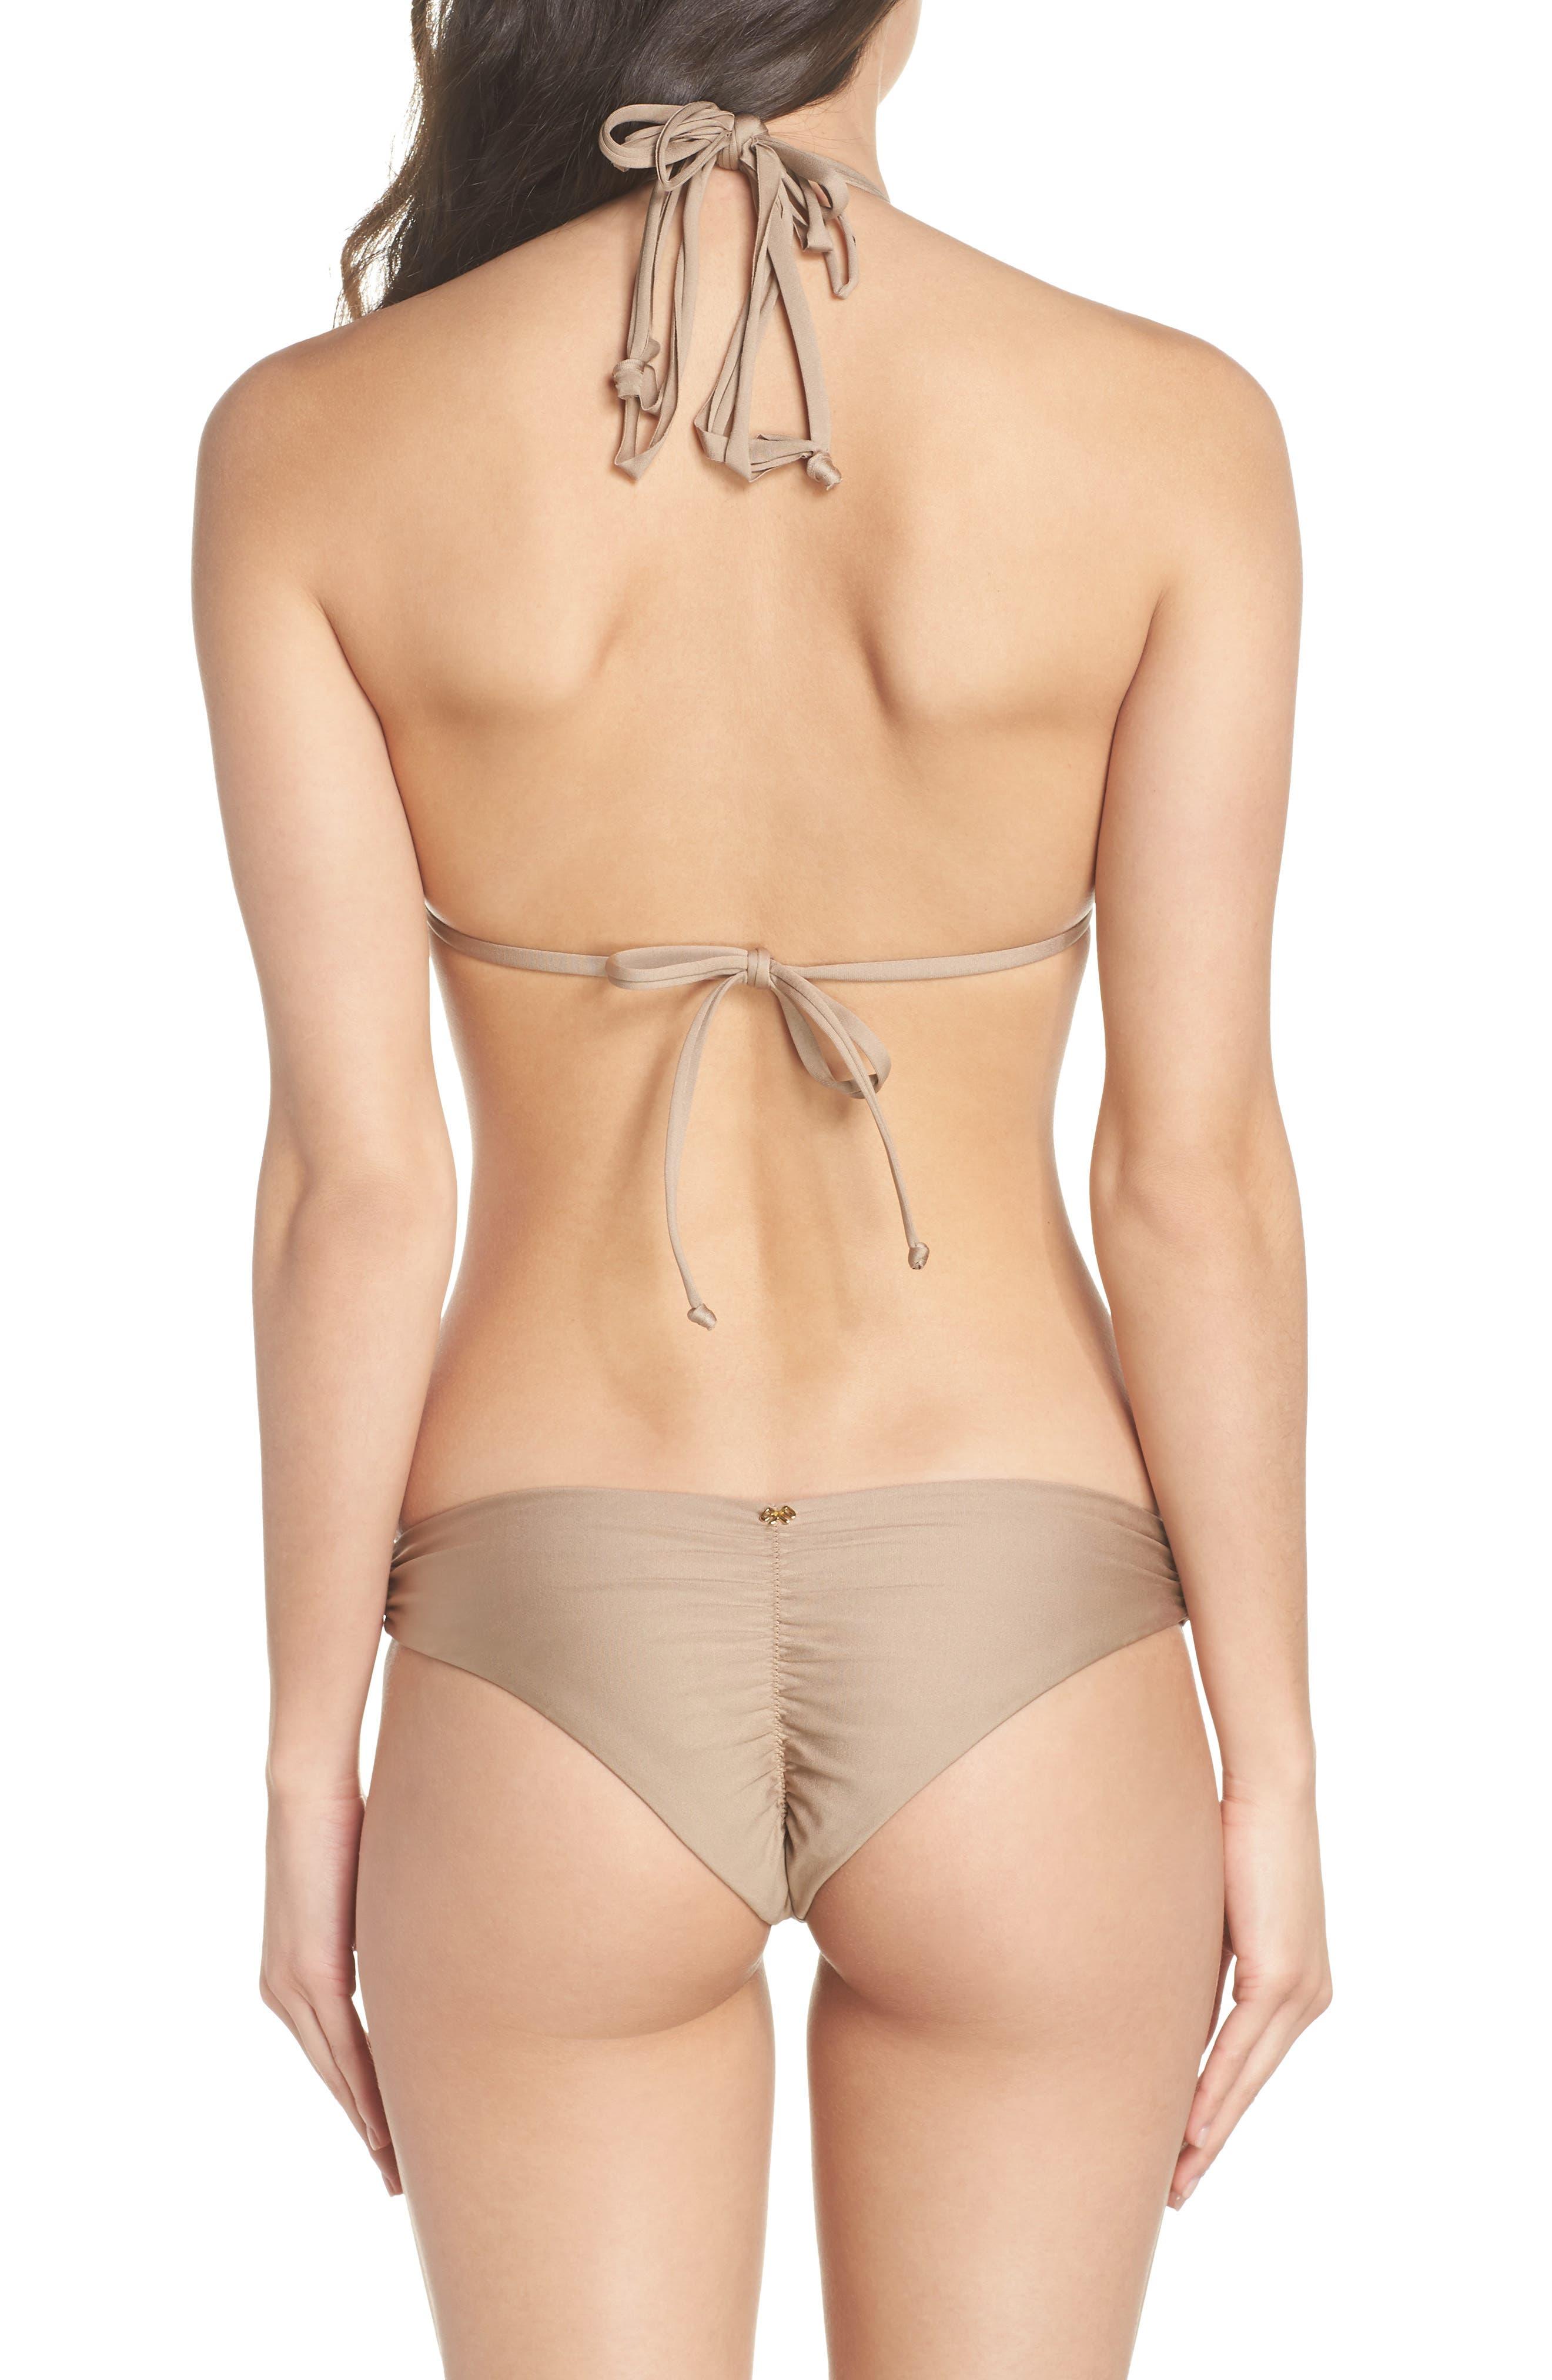 Isla Triangle Bikini Top,                             Alternate thumbnail 8, color,                             SANDSTONE